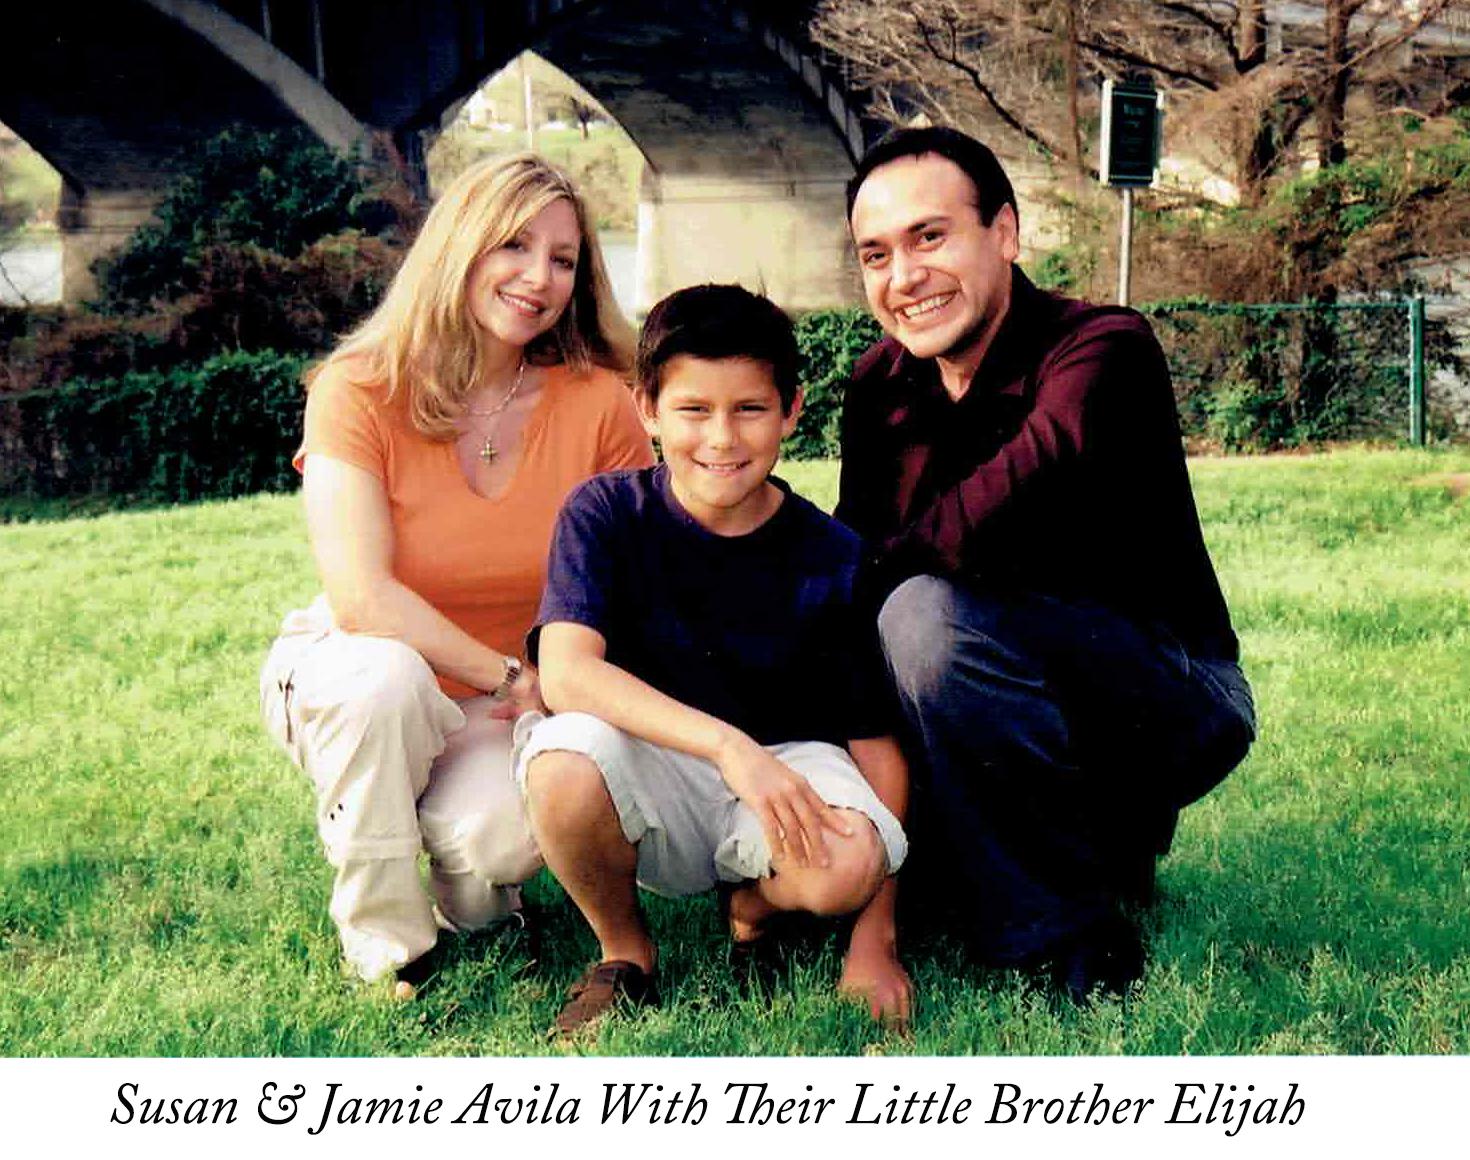 JamieAvila Susan and Littlejpg